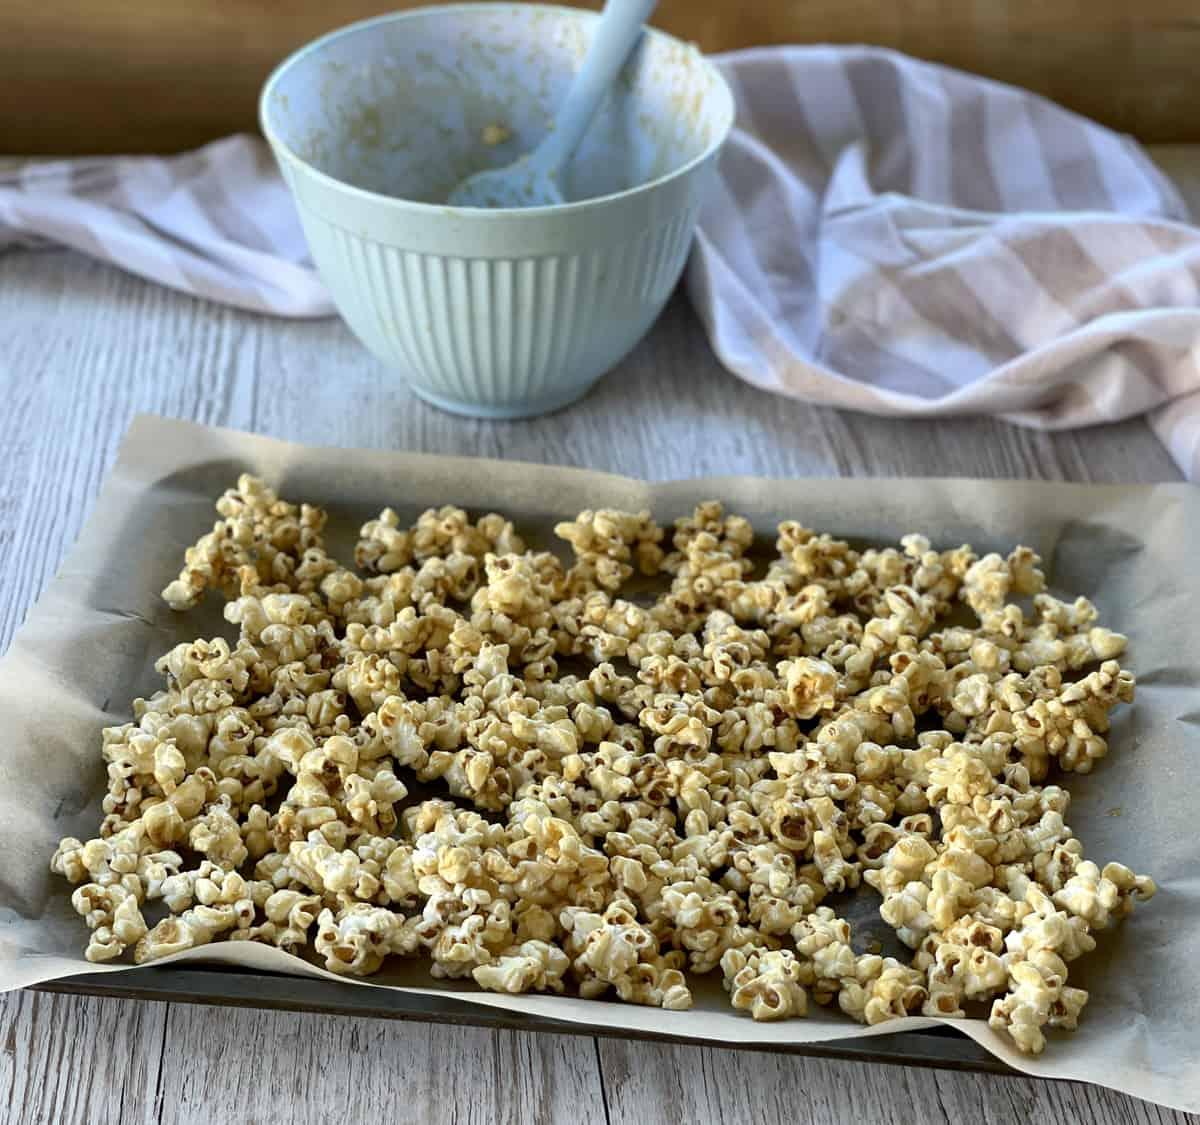 Tray of maple syrup coated popcorn